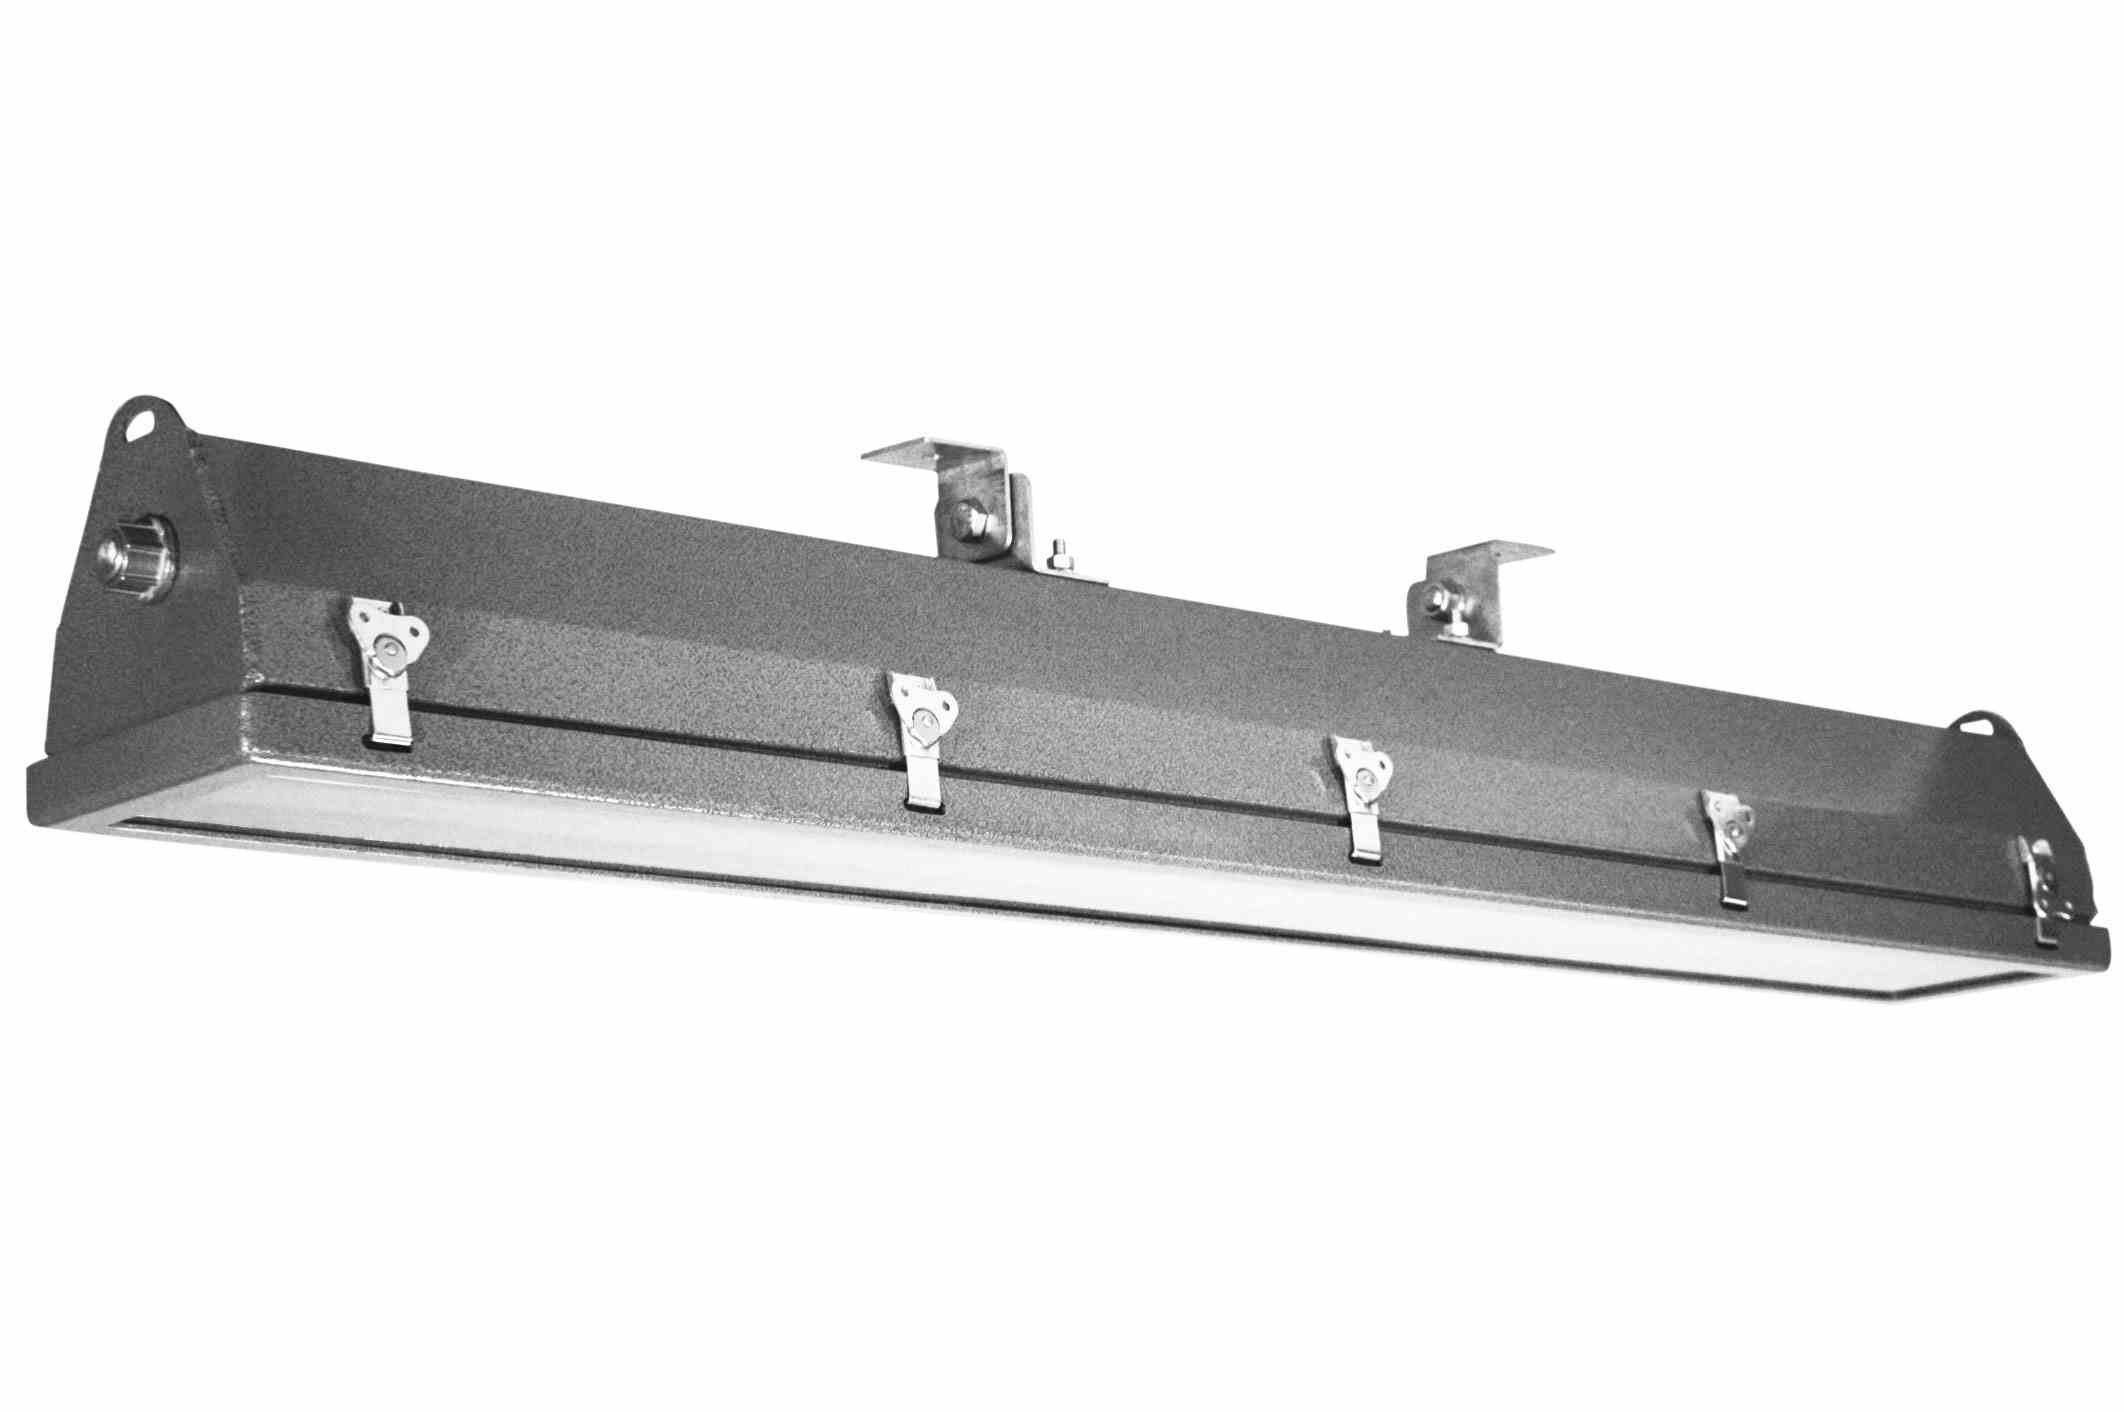 Class 1 Div 2 LED Pivoting Light - 4 Foot 2 Lamp - Borosilicate Glass Lens - Offshore LED Rig Light(-120V-277V AC-4500K-3/4) by Larson Electronics